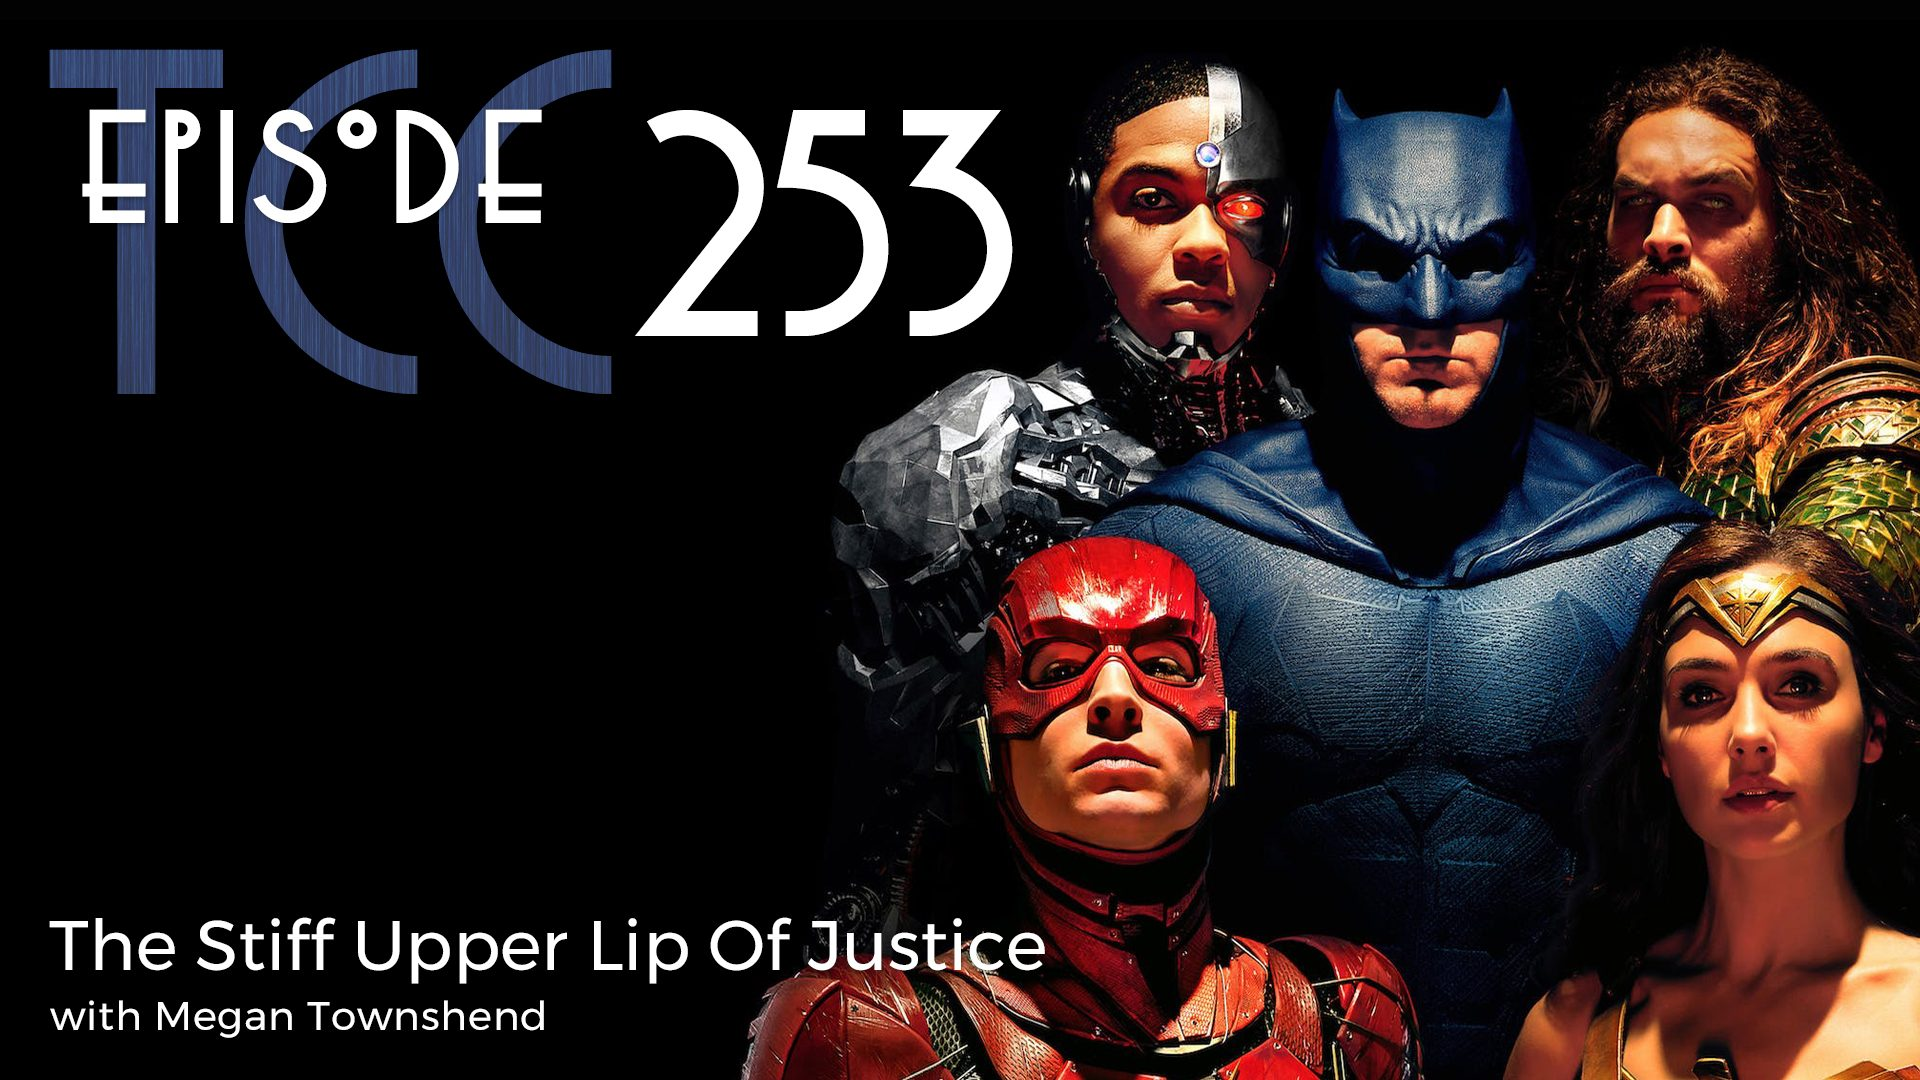 The Citadel Cafe 253: The Stiff Upper Lip Of Justice